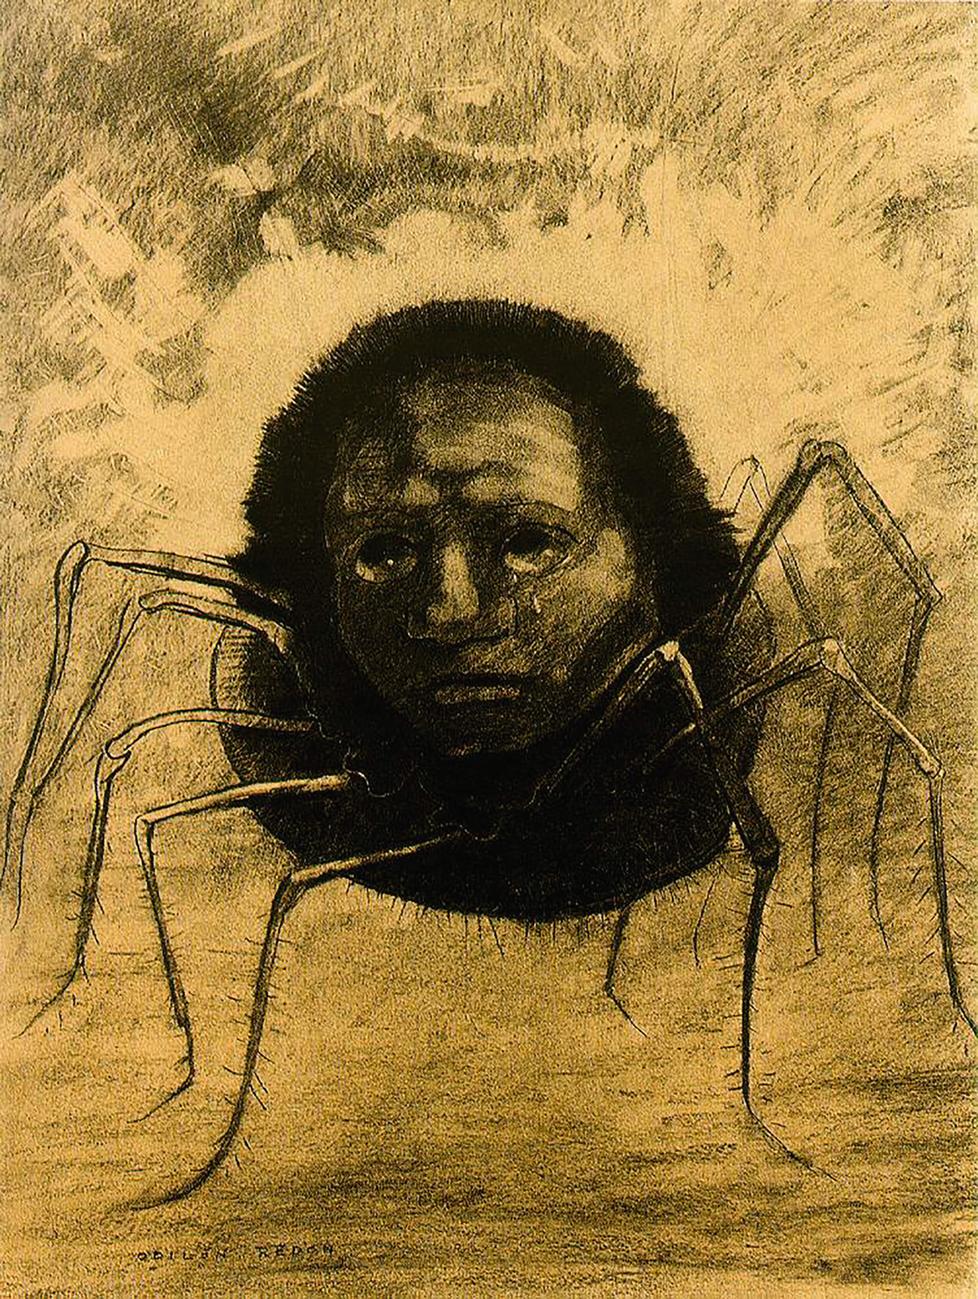 Remede De Grand Mere Contre Les Moucherons Dans La Maison said the spider to the fly: the triumph of the minor in